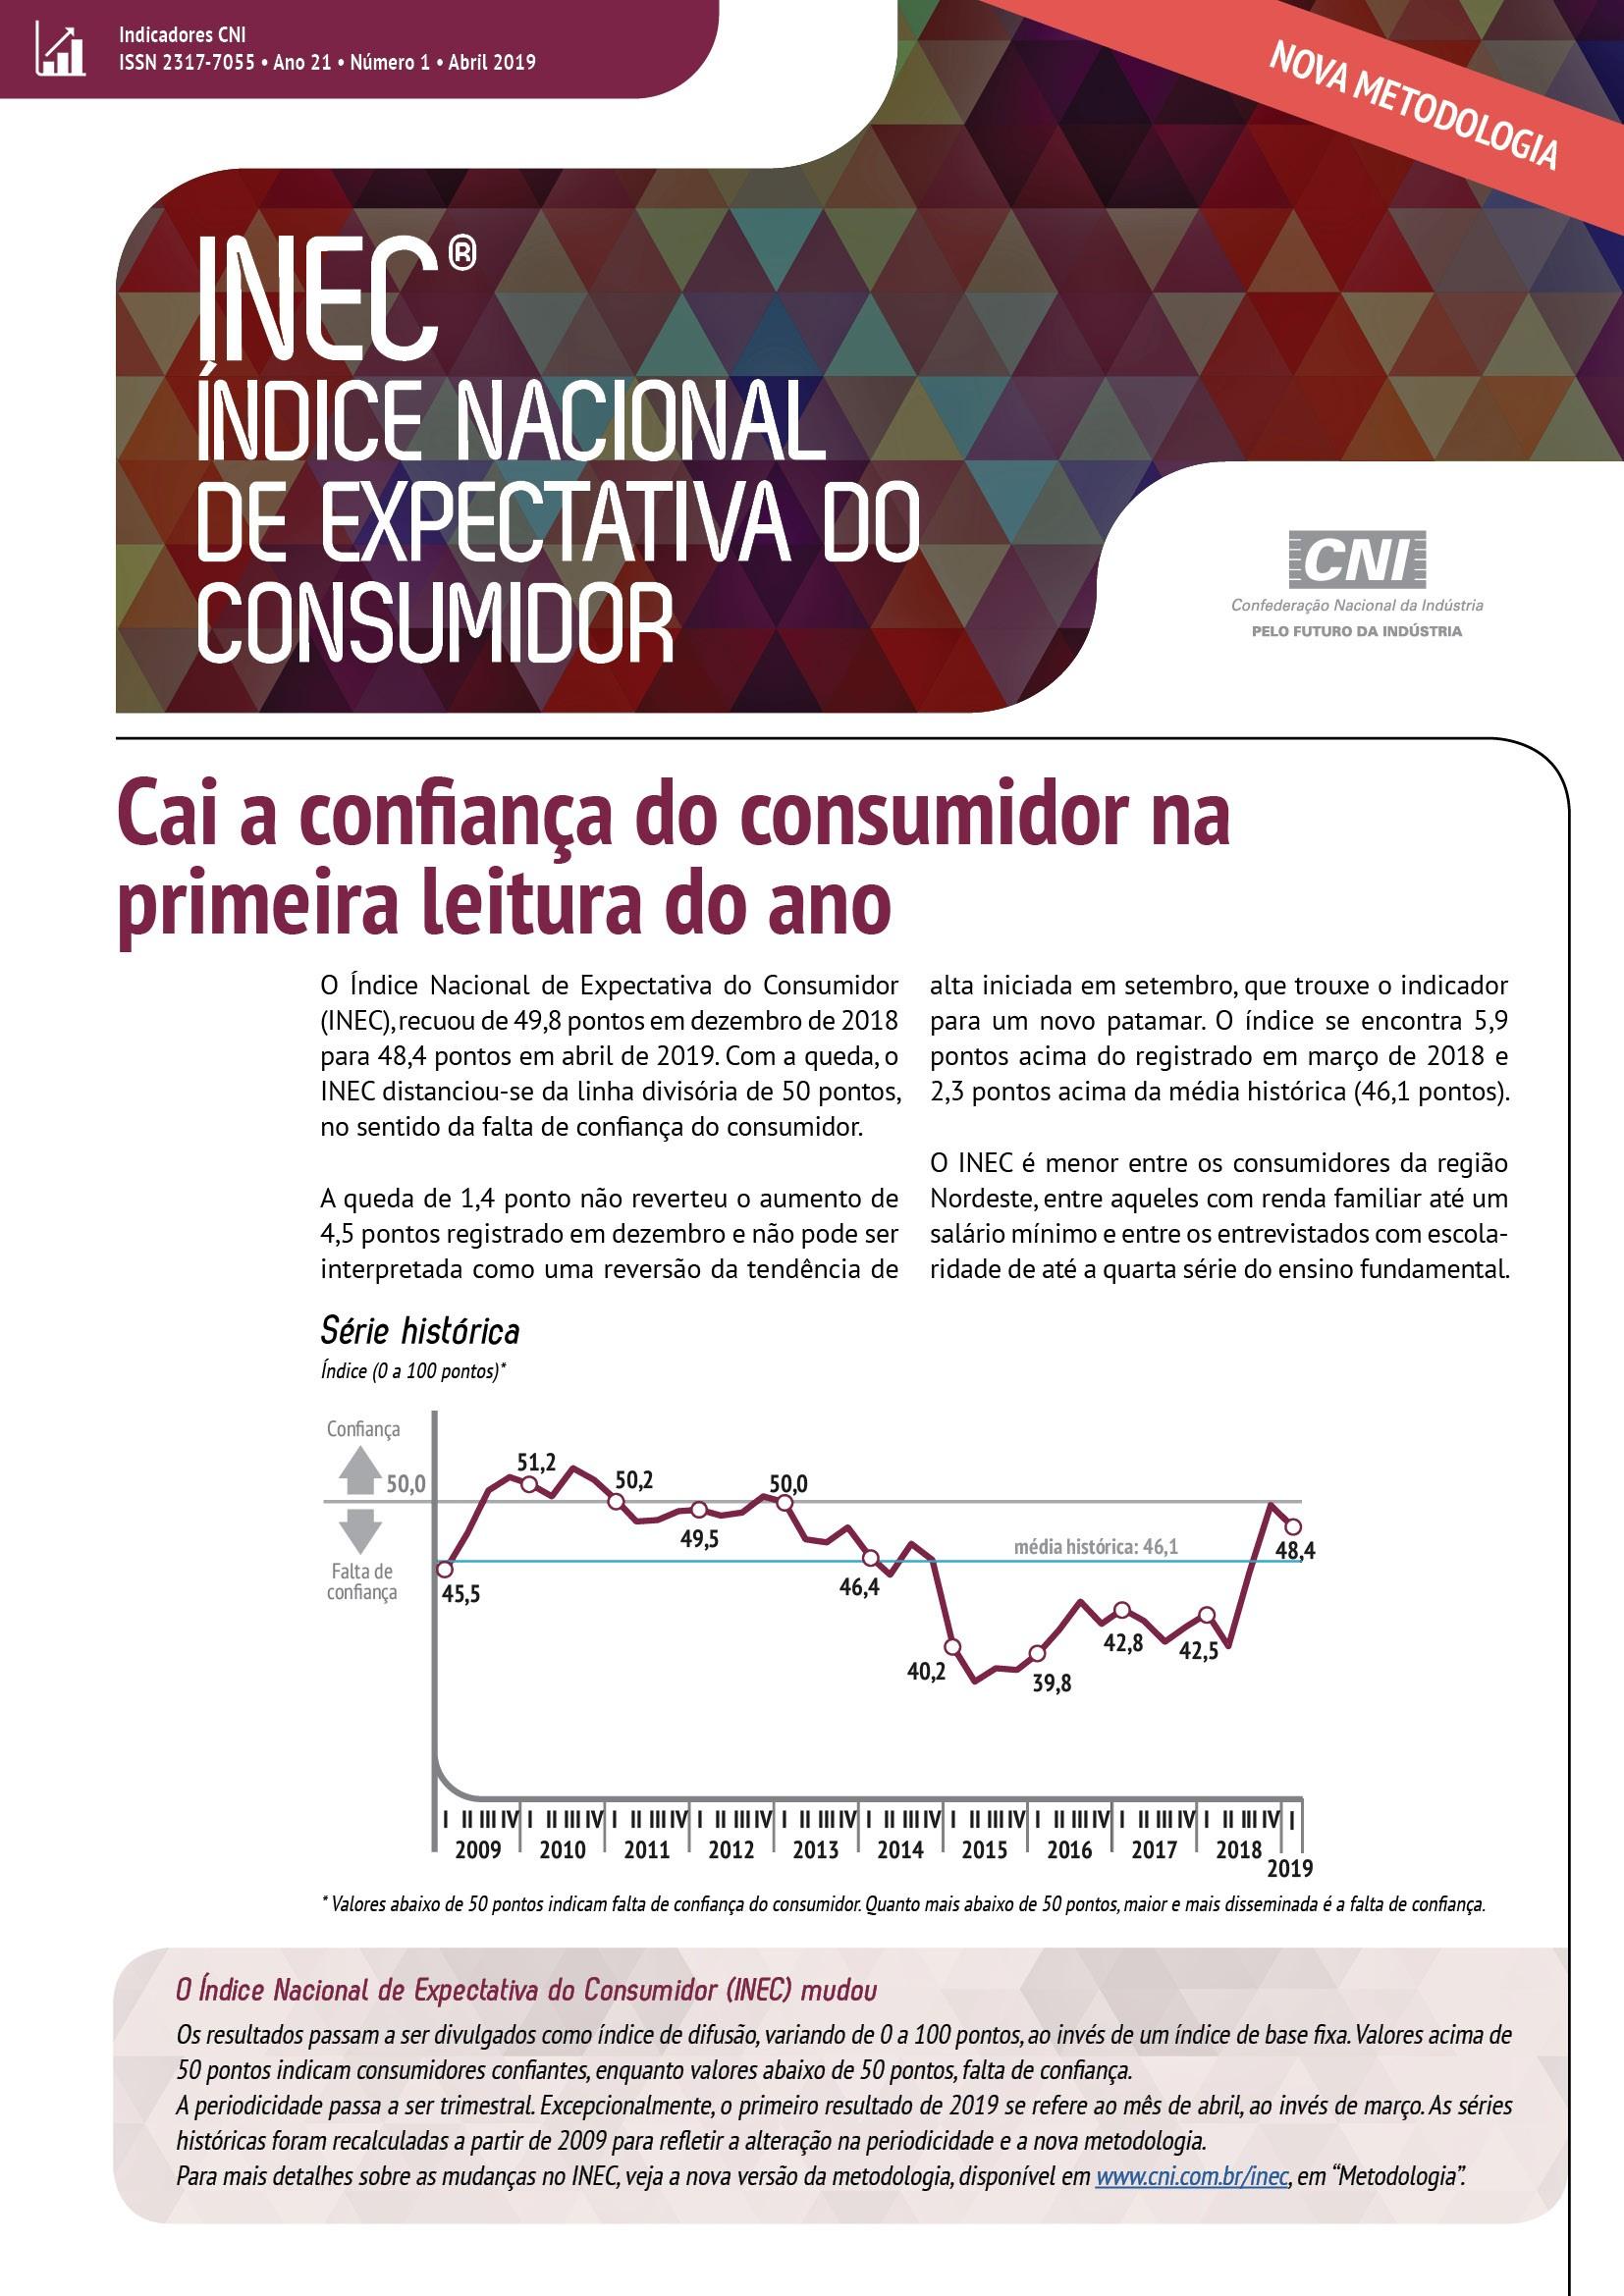 Calendario Para O Ano 2019 Brasileiro Más Populares Rsb 12 Padr£o De Vida Portal Da Indºstria Cni Of Calendario Para O Ano 2019 Brasileiro Más Populares Index Of Midia